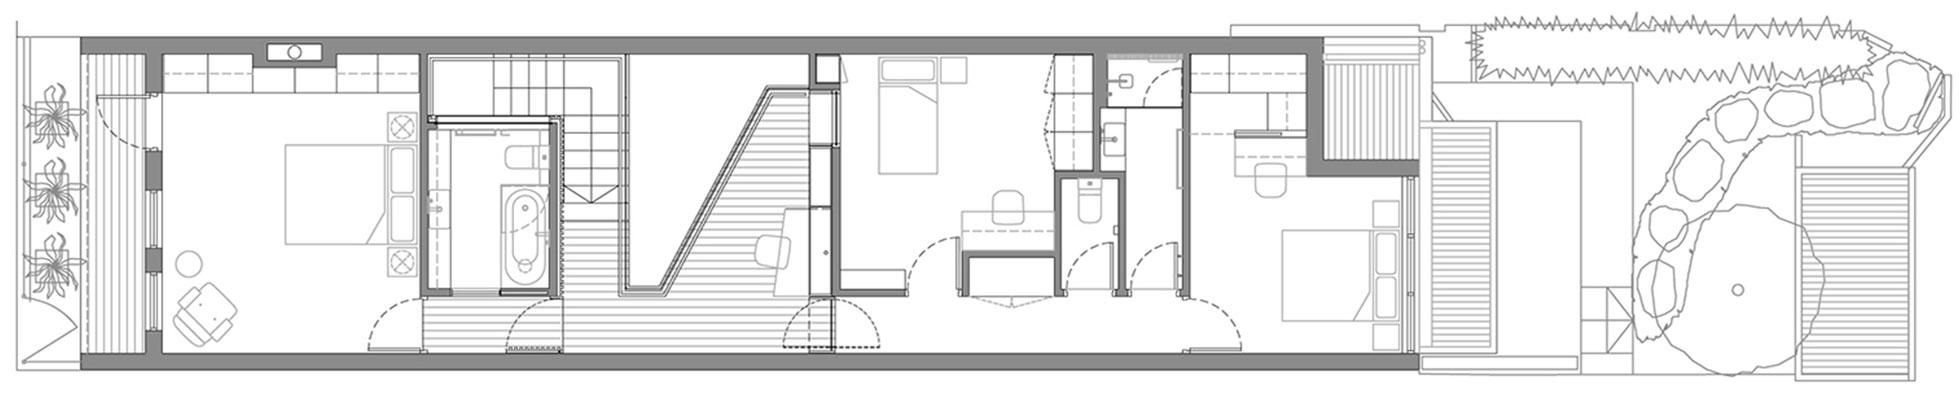 South-Melbourne-House-2-16